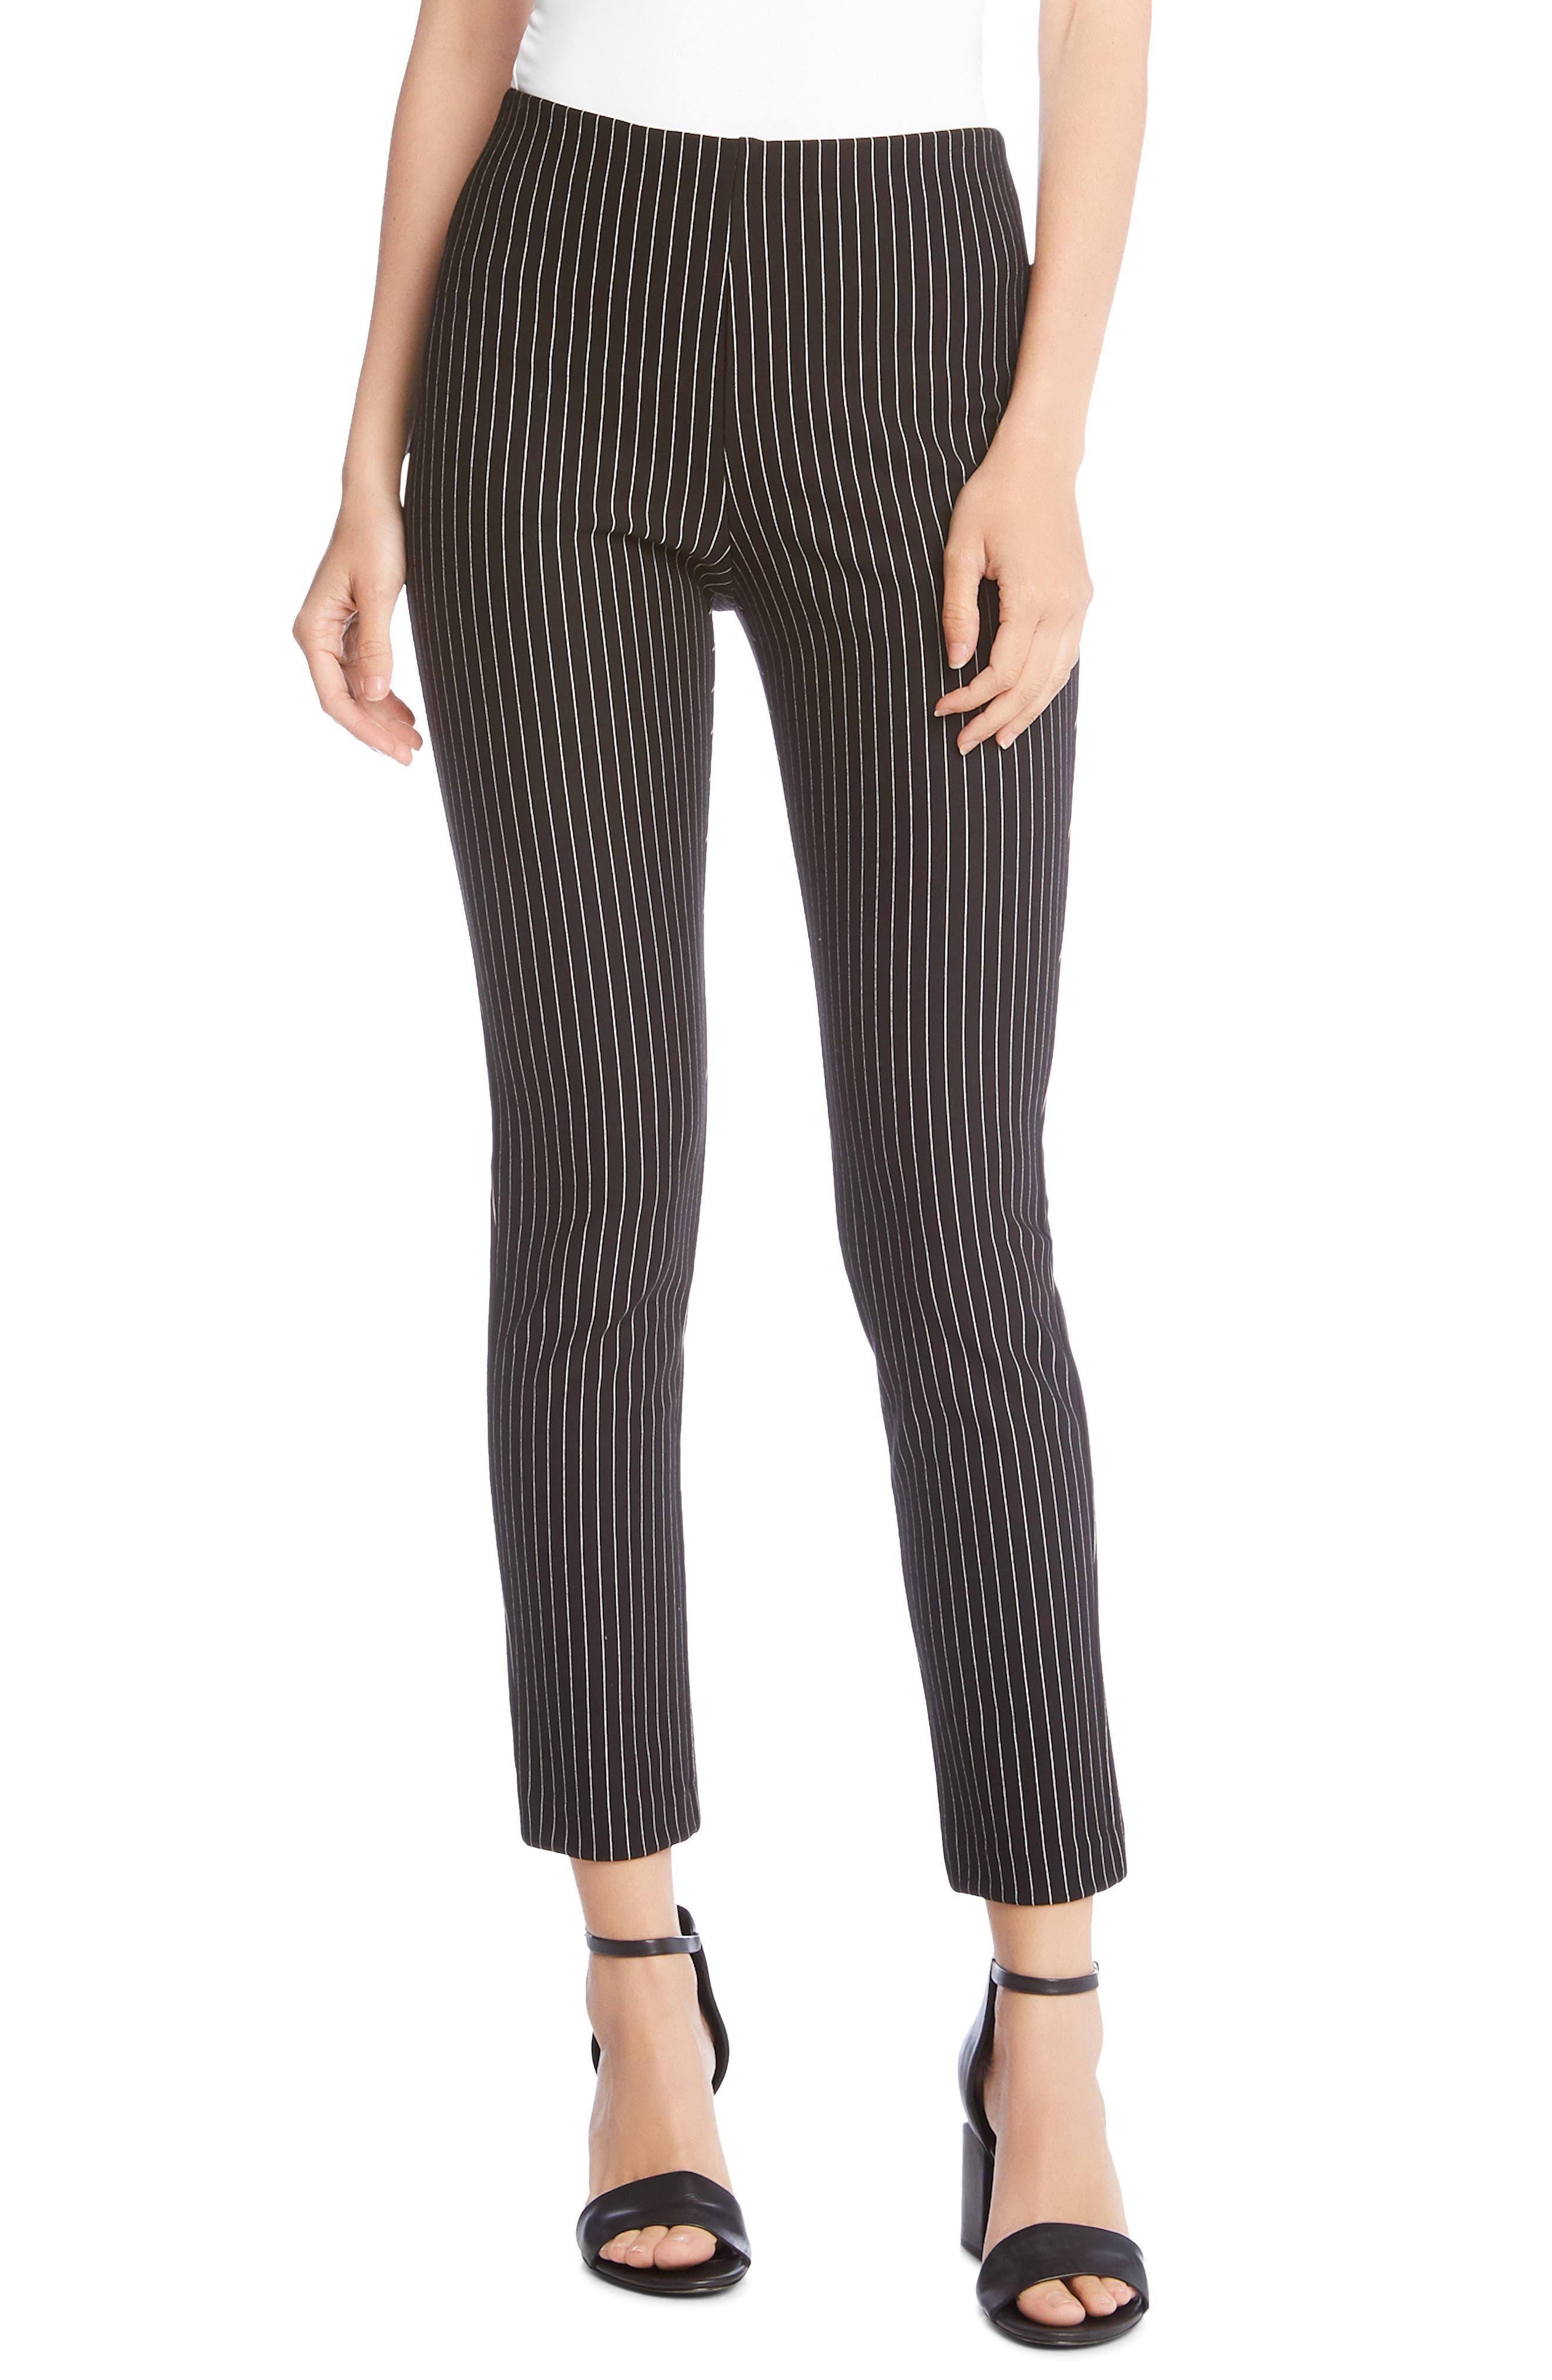 KAREN KANE, Piper Stripe Ankle Skinny Pants, Main thumbnail 1, color, 011